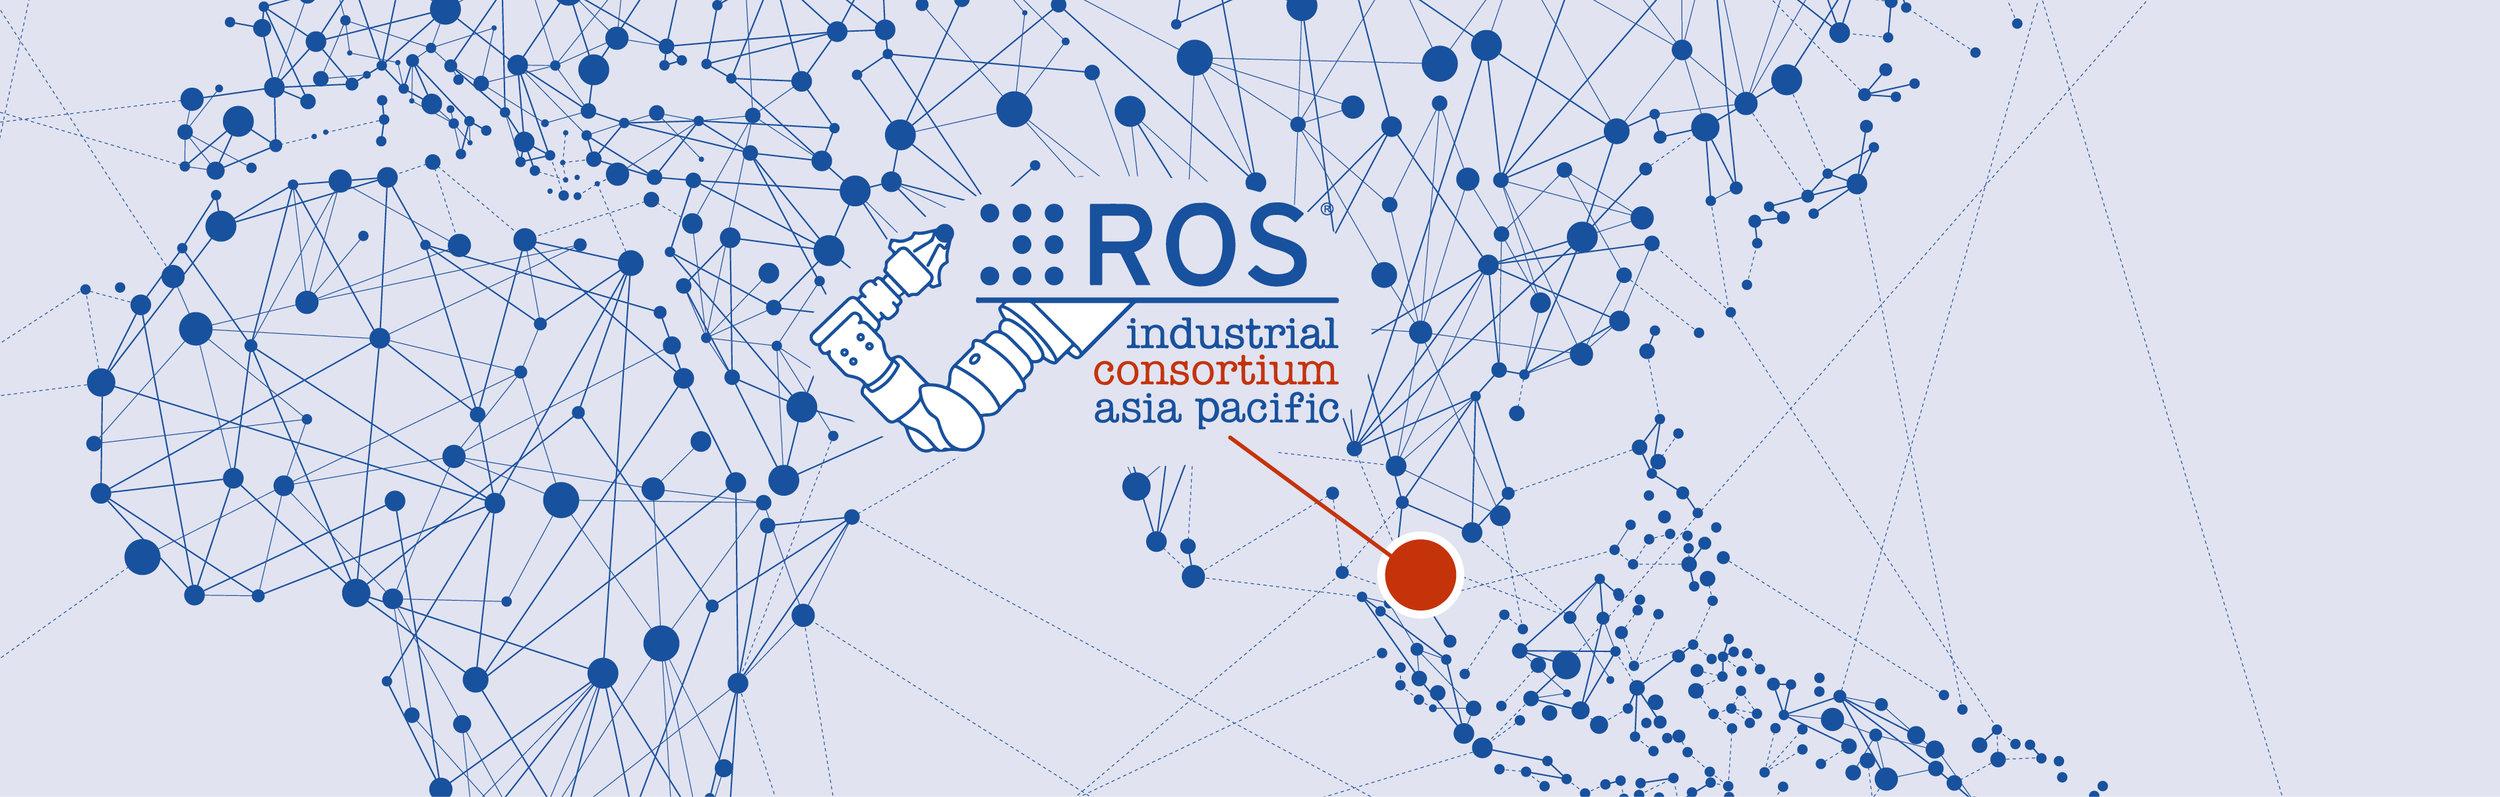 ROS-I-MAP-Asia-909x290.jpg